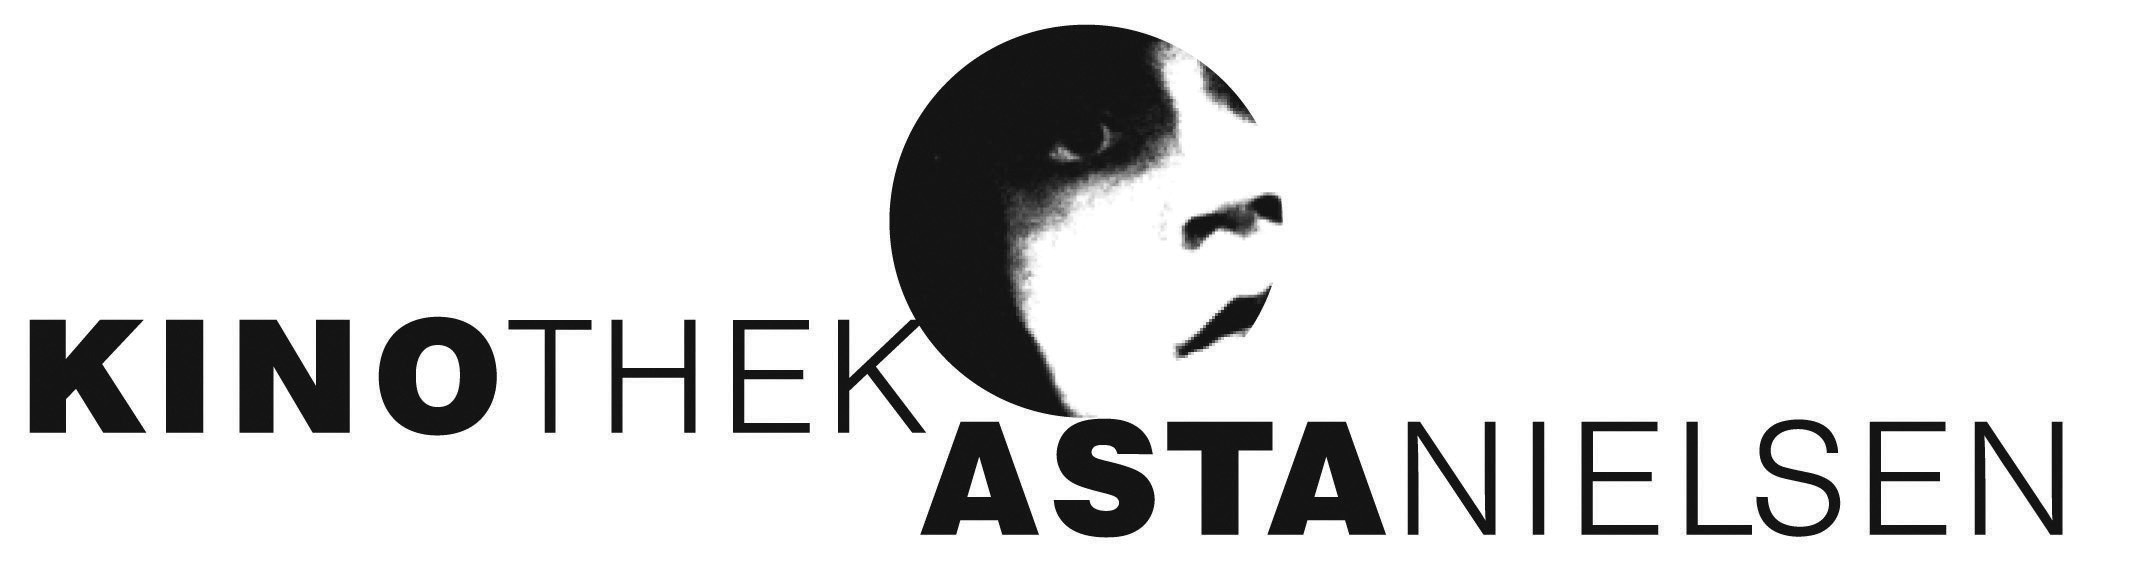 Kinothek Asta Nielsen